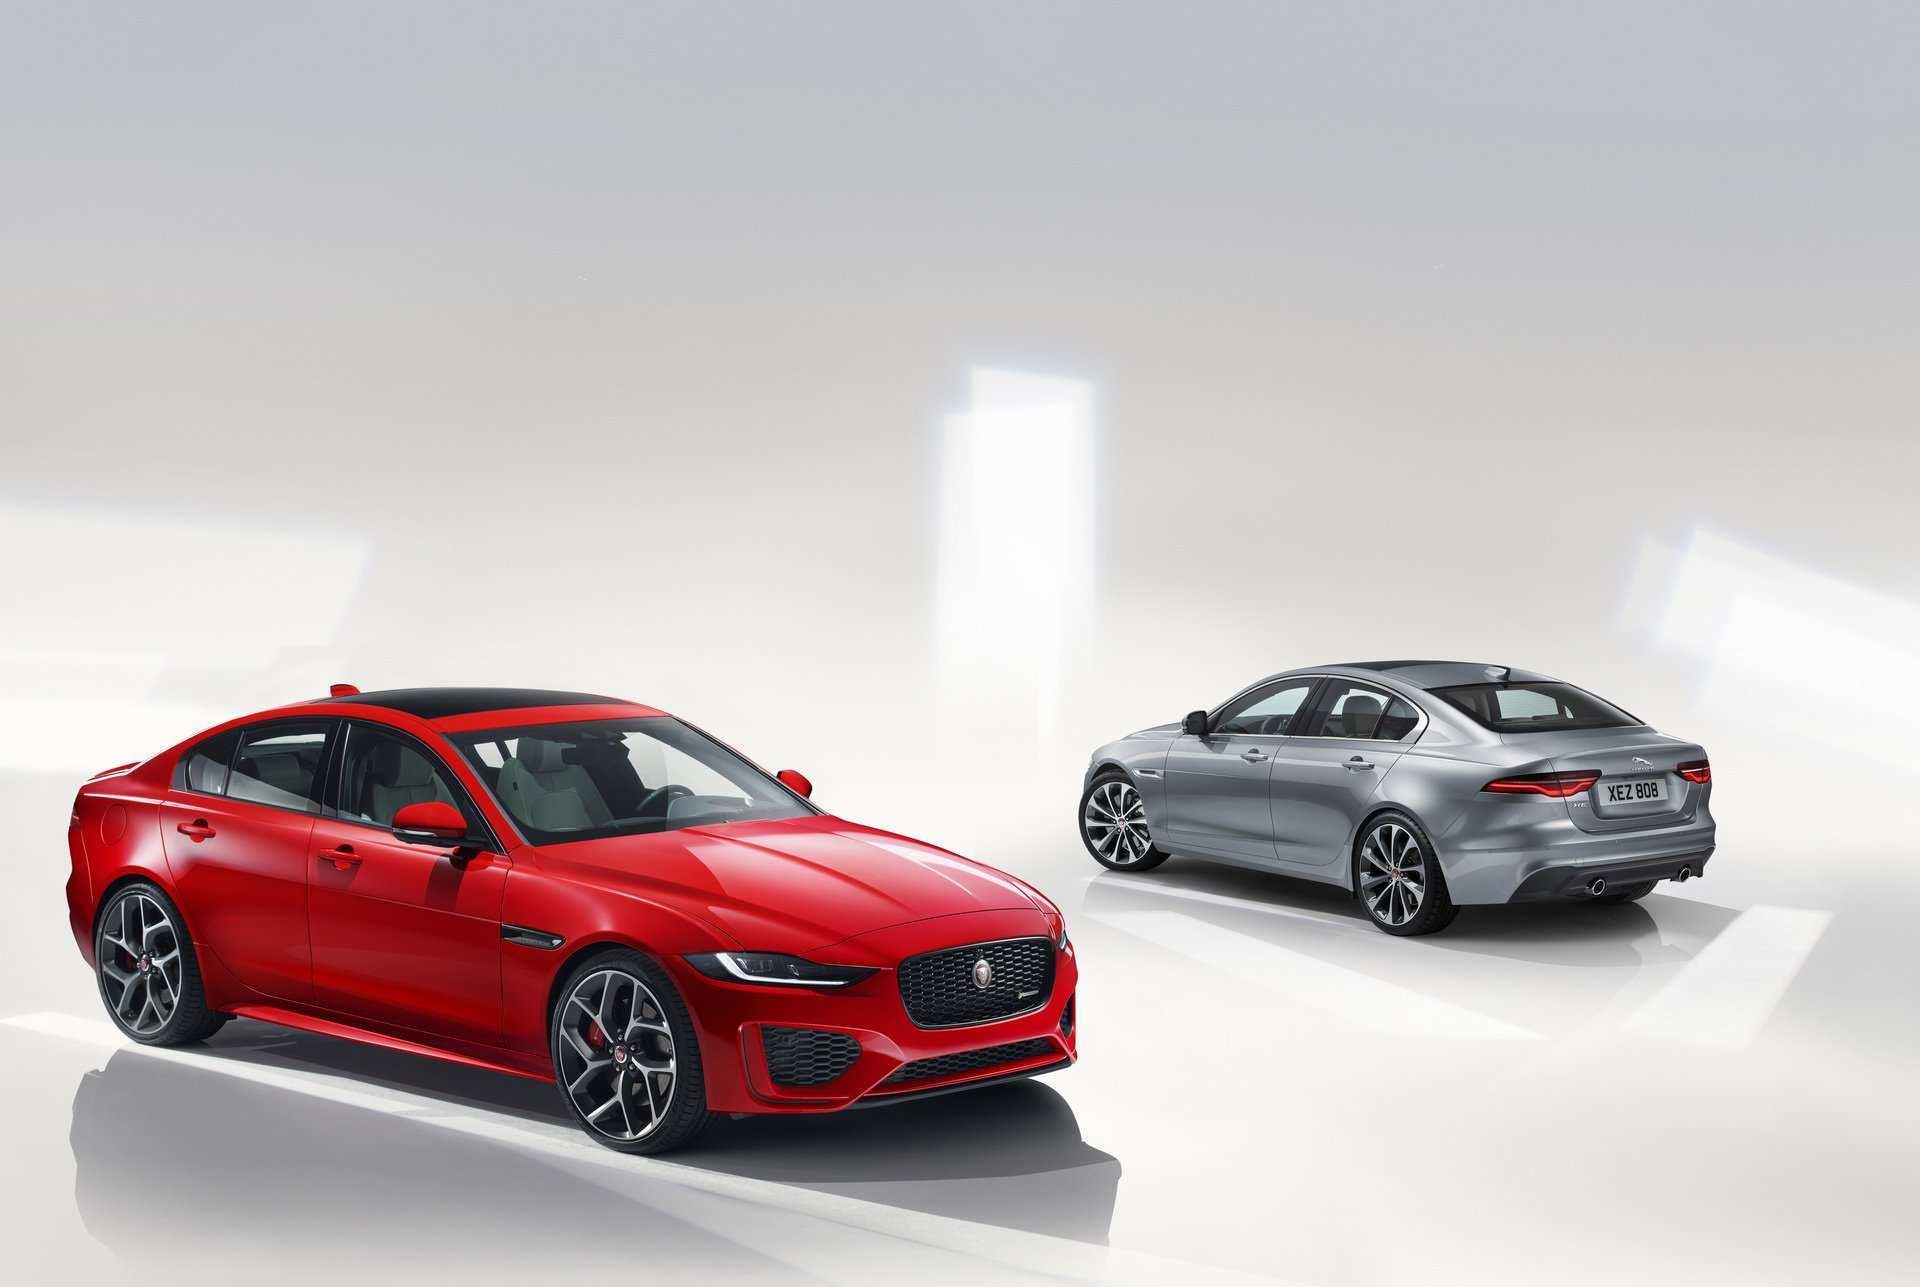 38 Great Jaguar Sedan 2020 New Concept by Jaguar Sedan 2020